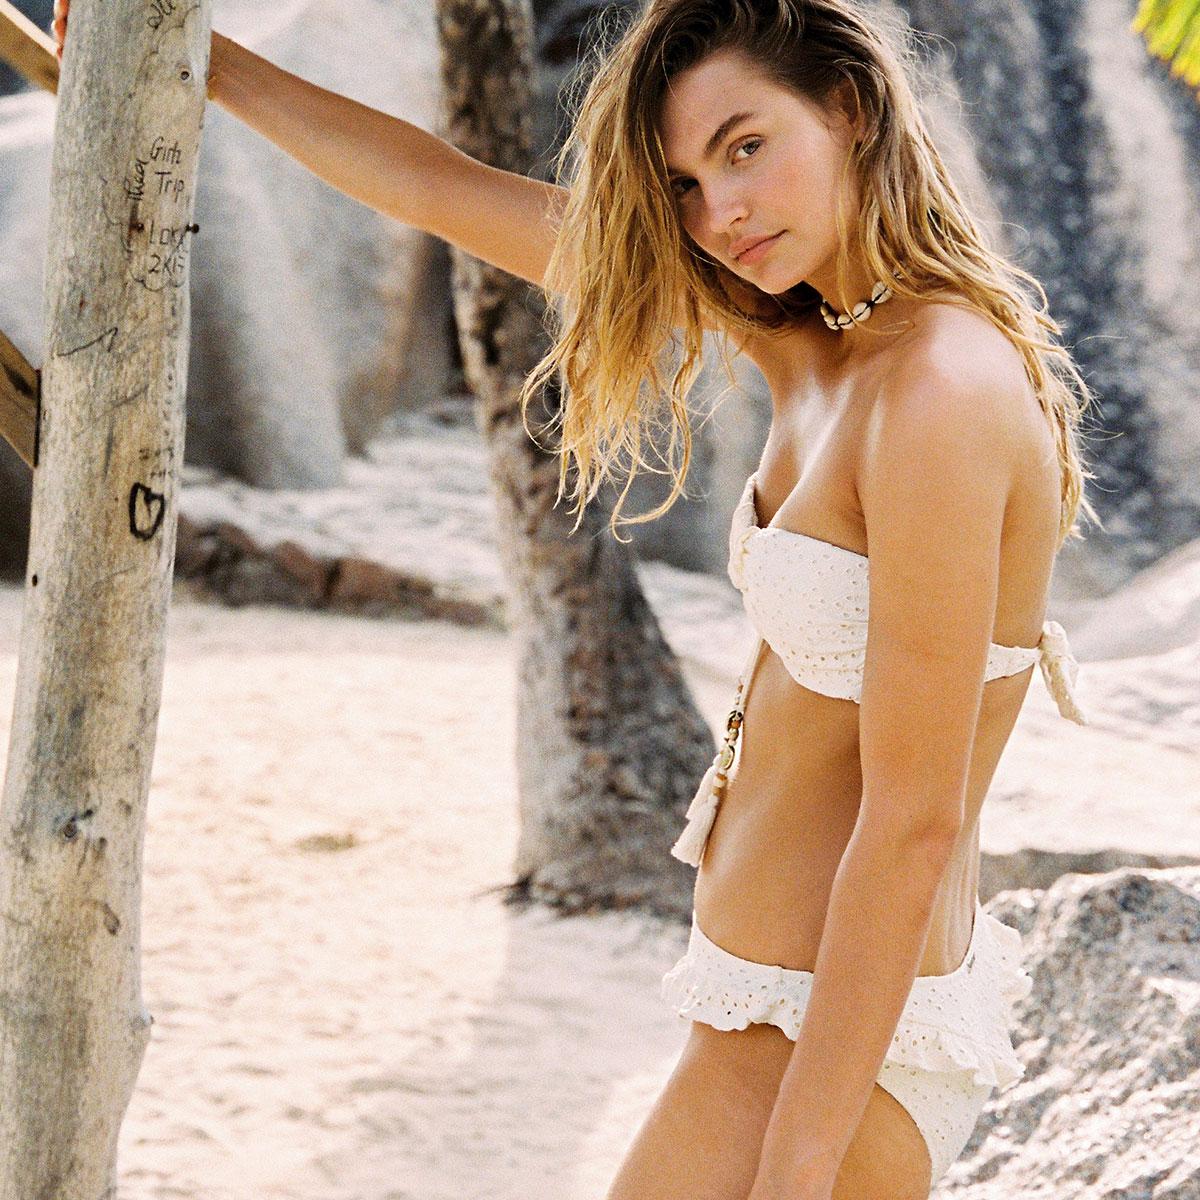 Bas de maillot de bain Culotte Beige écru Beach Broderie